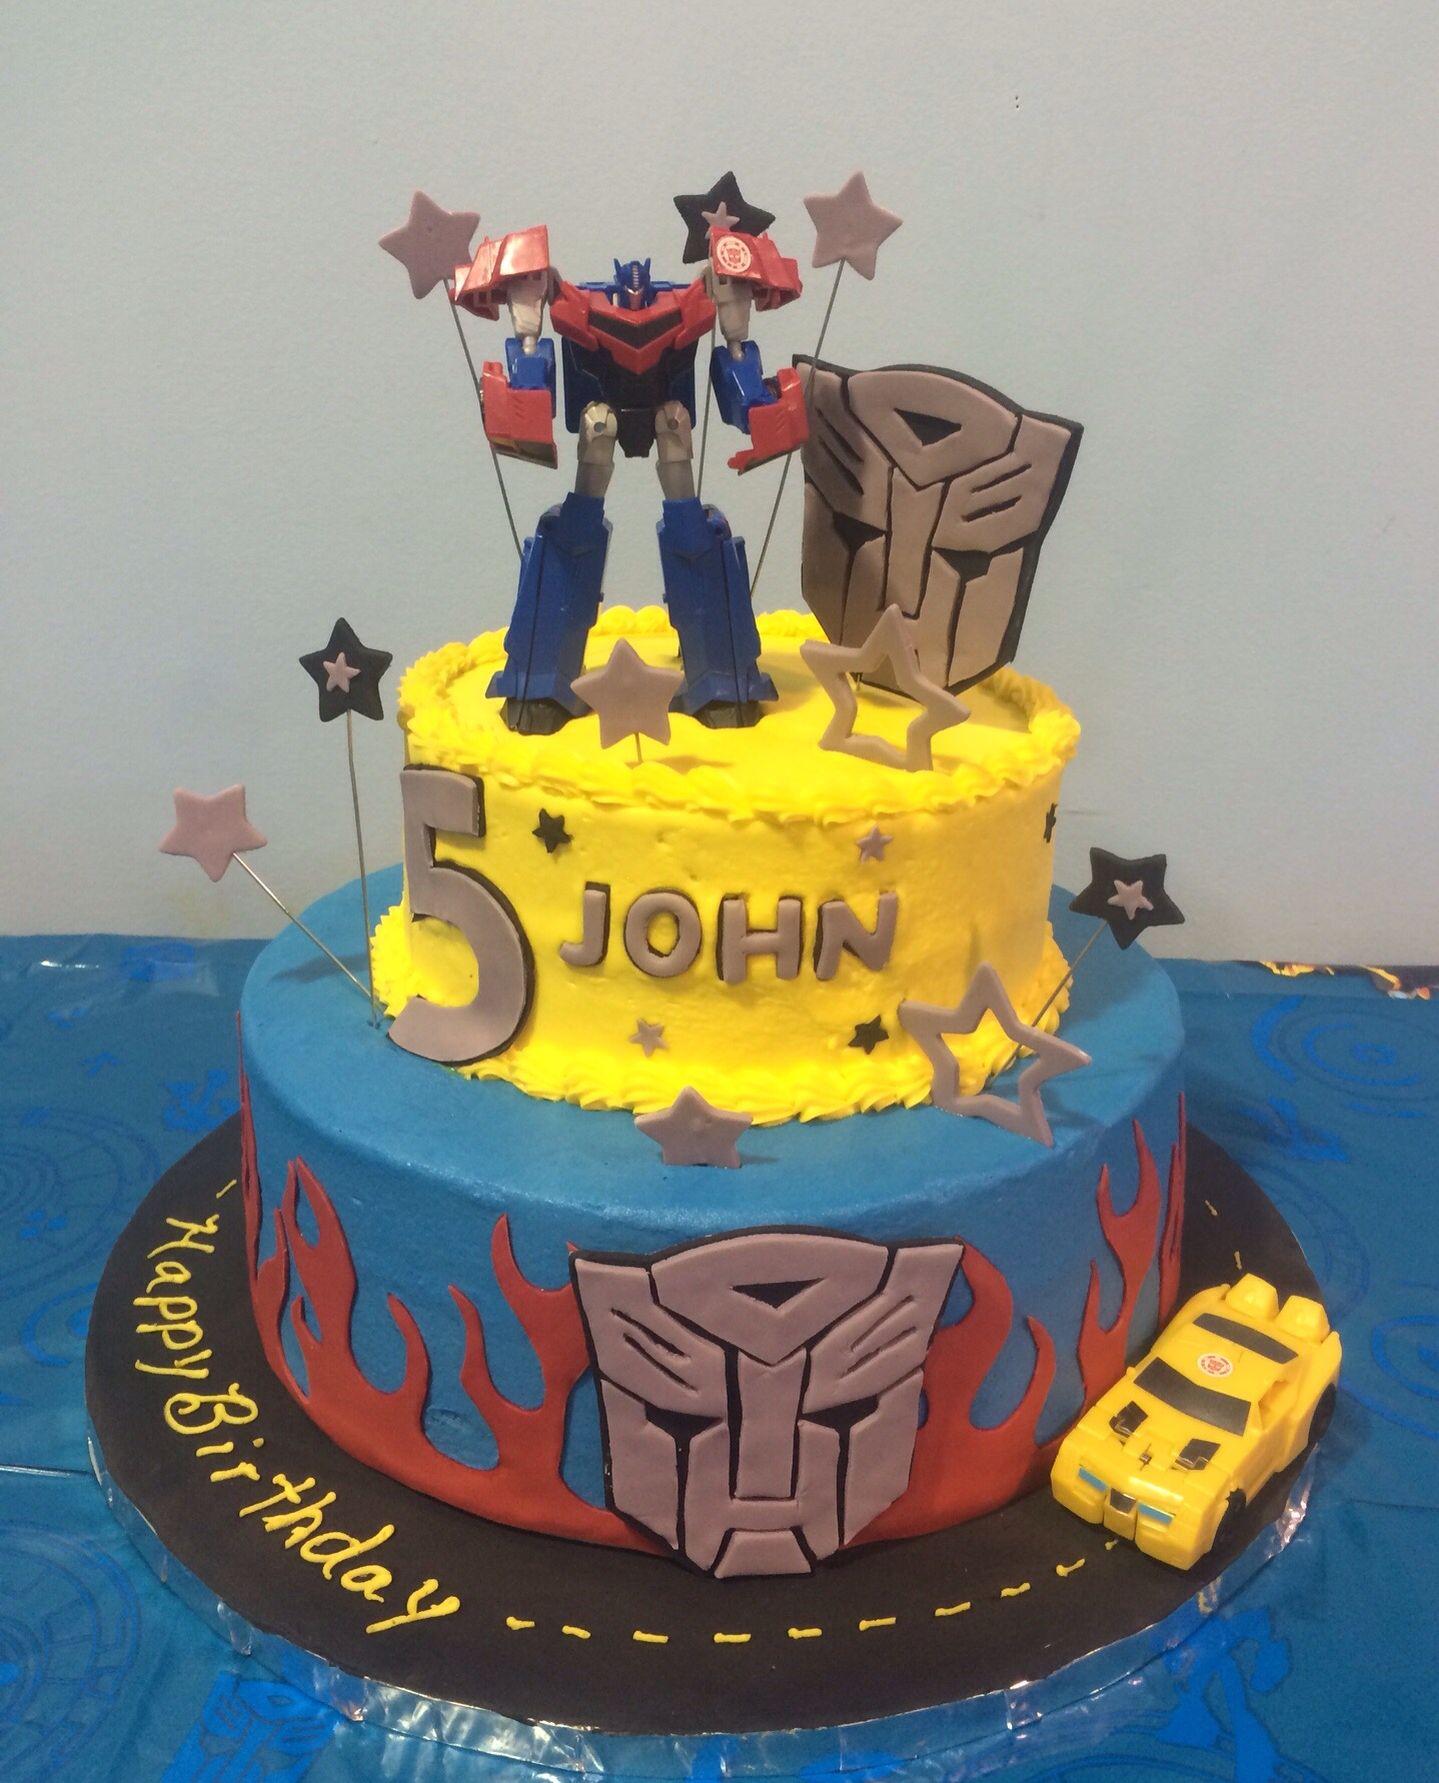 My Grandsons 5th Birthday Cake Transformers